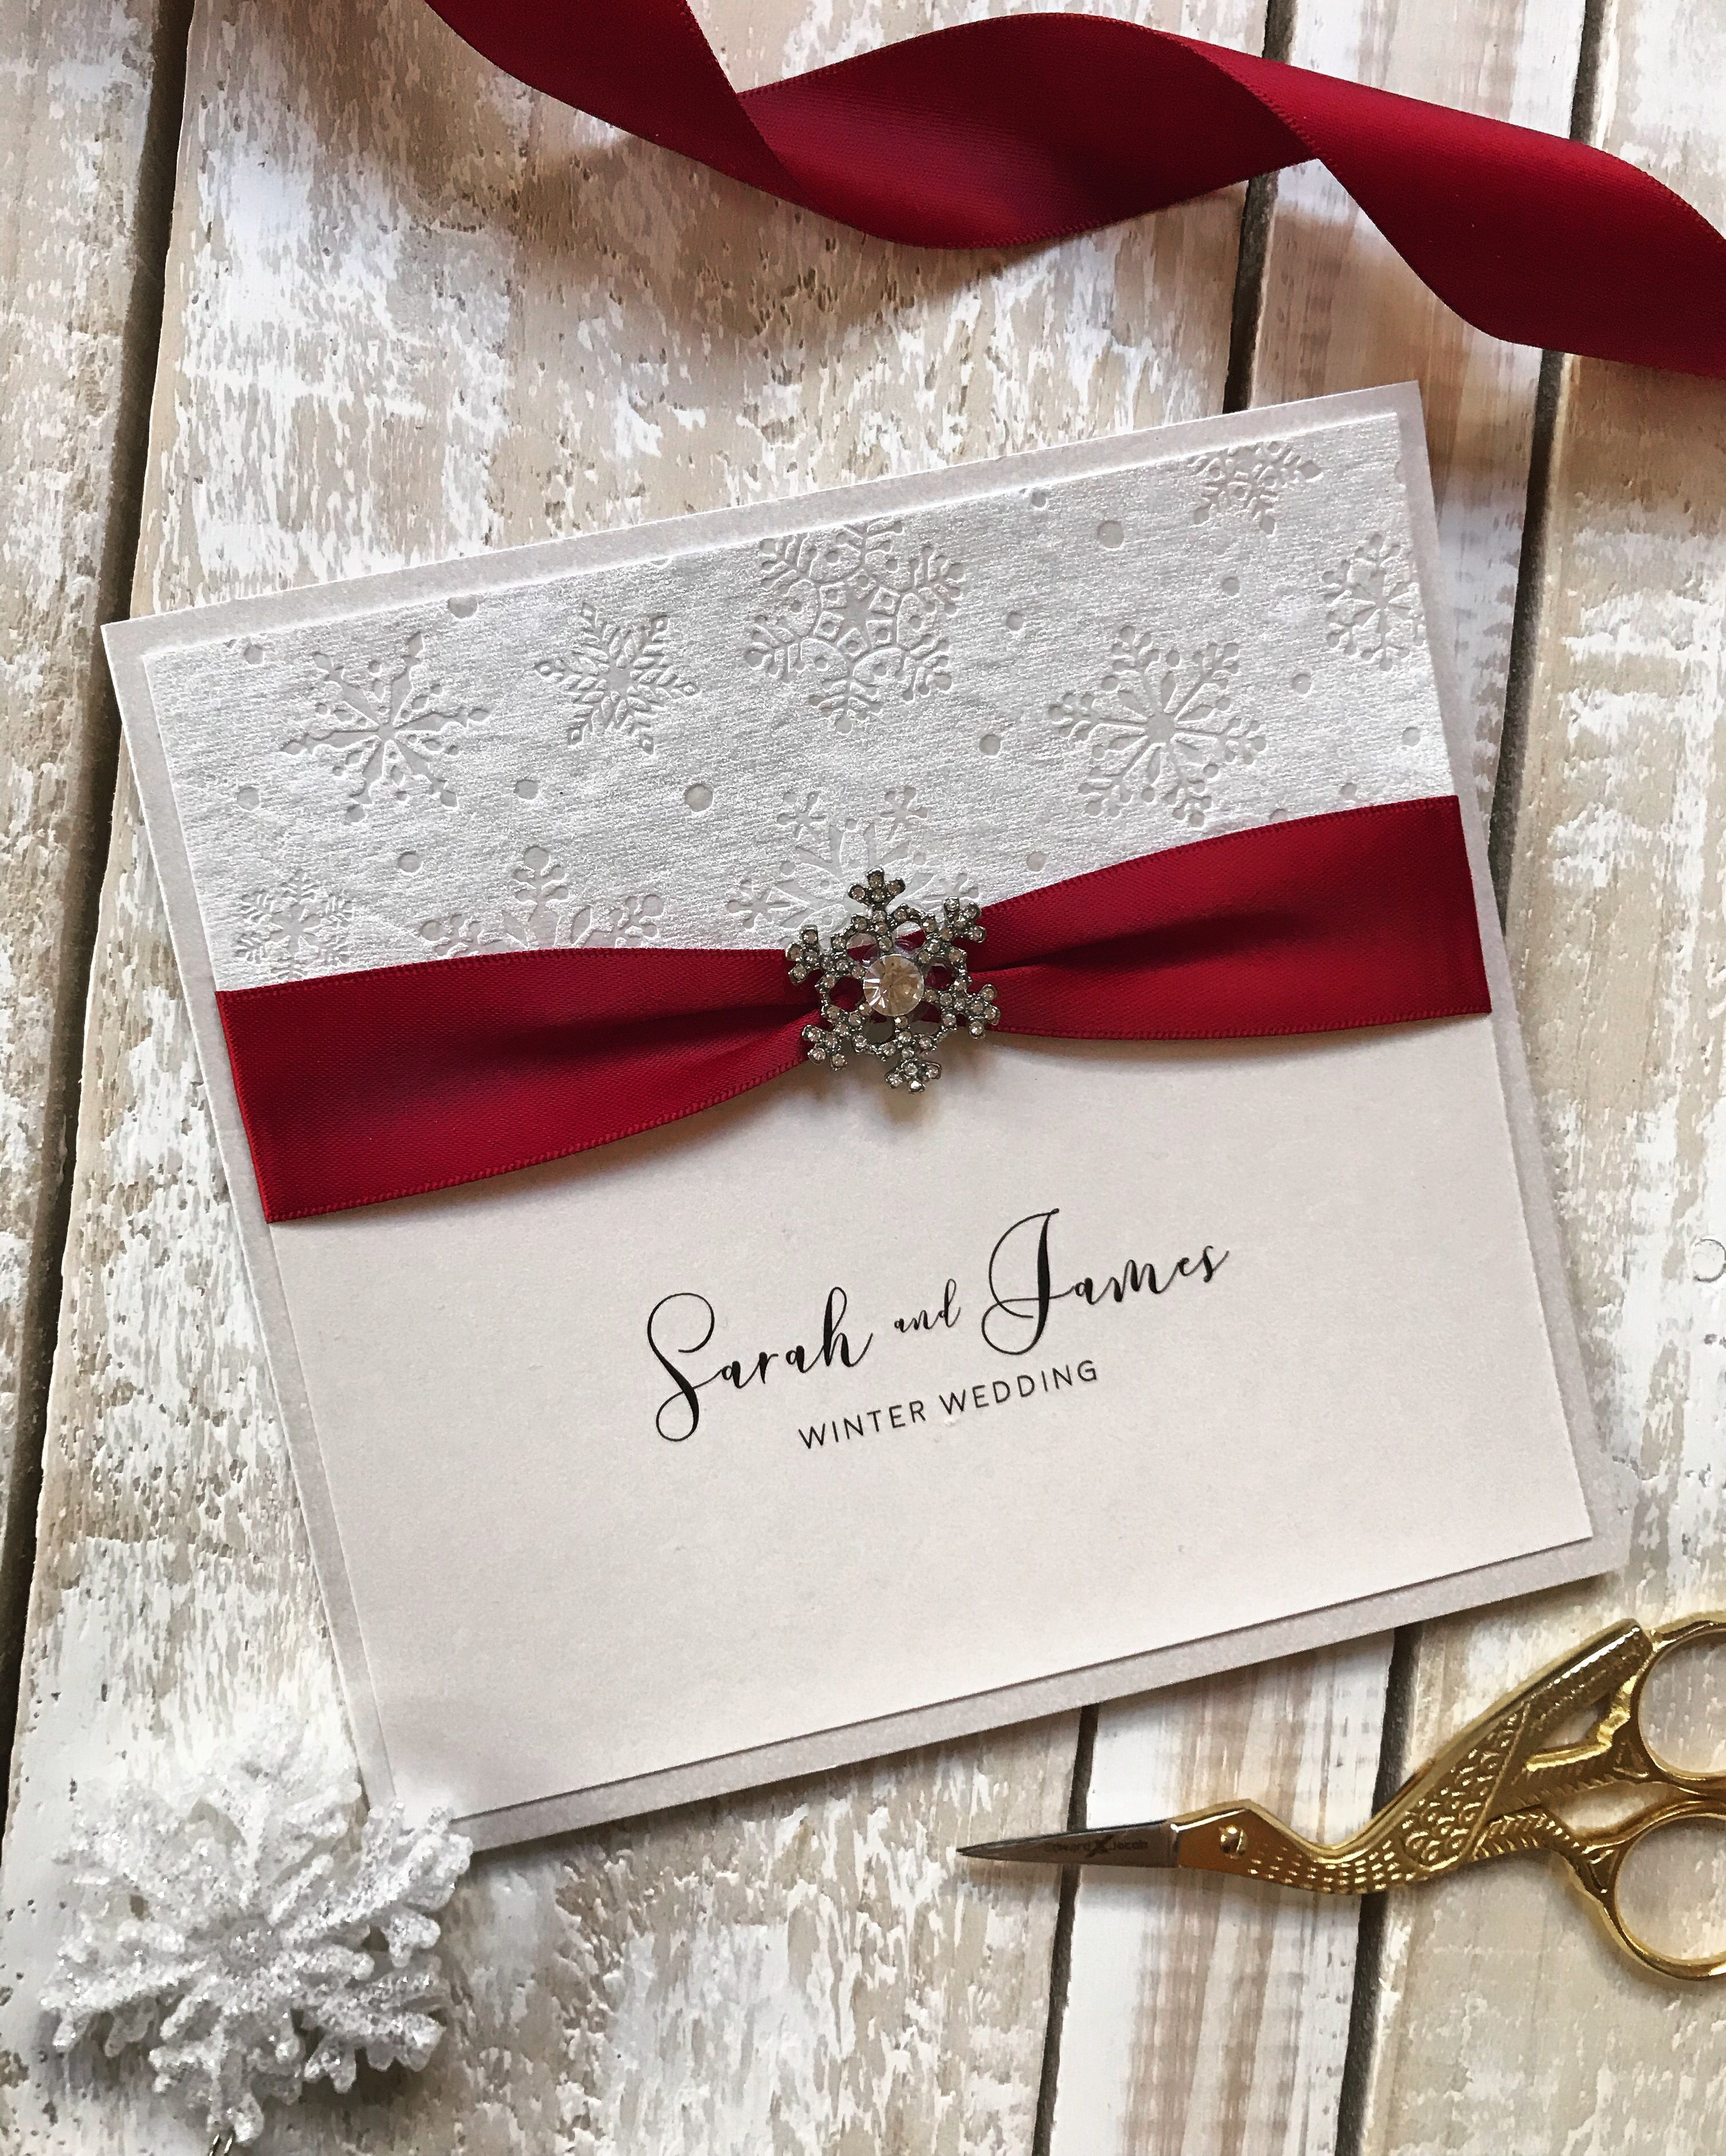 Winter wedding invitation. Burgundy luxury satin gathered